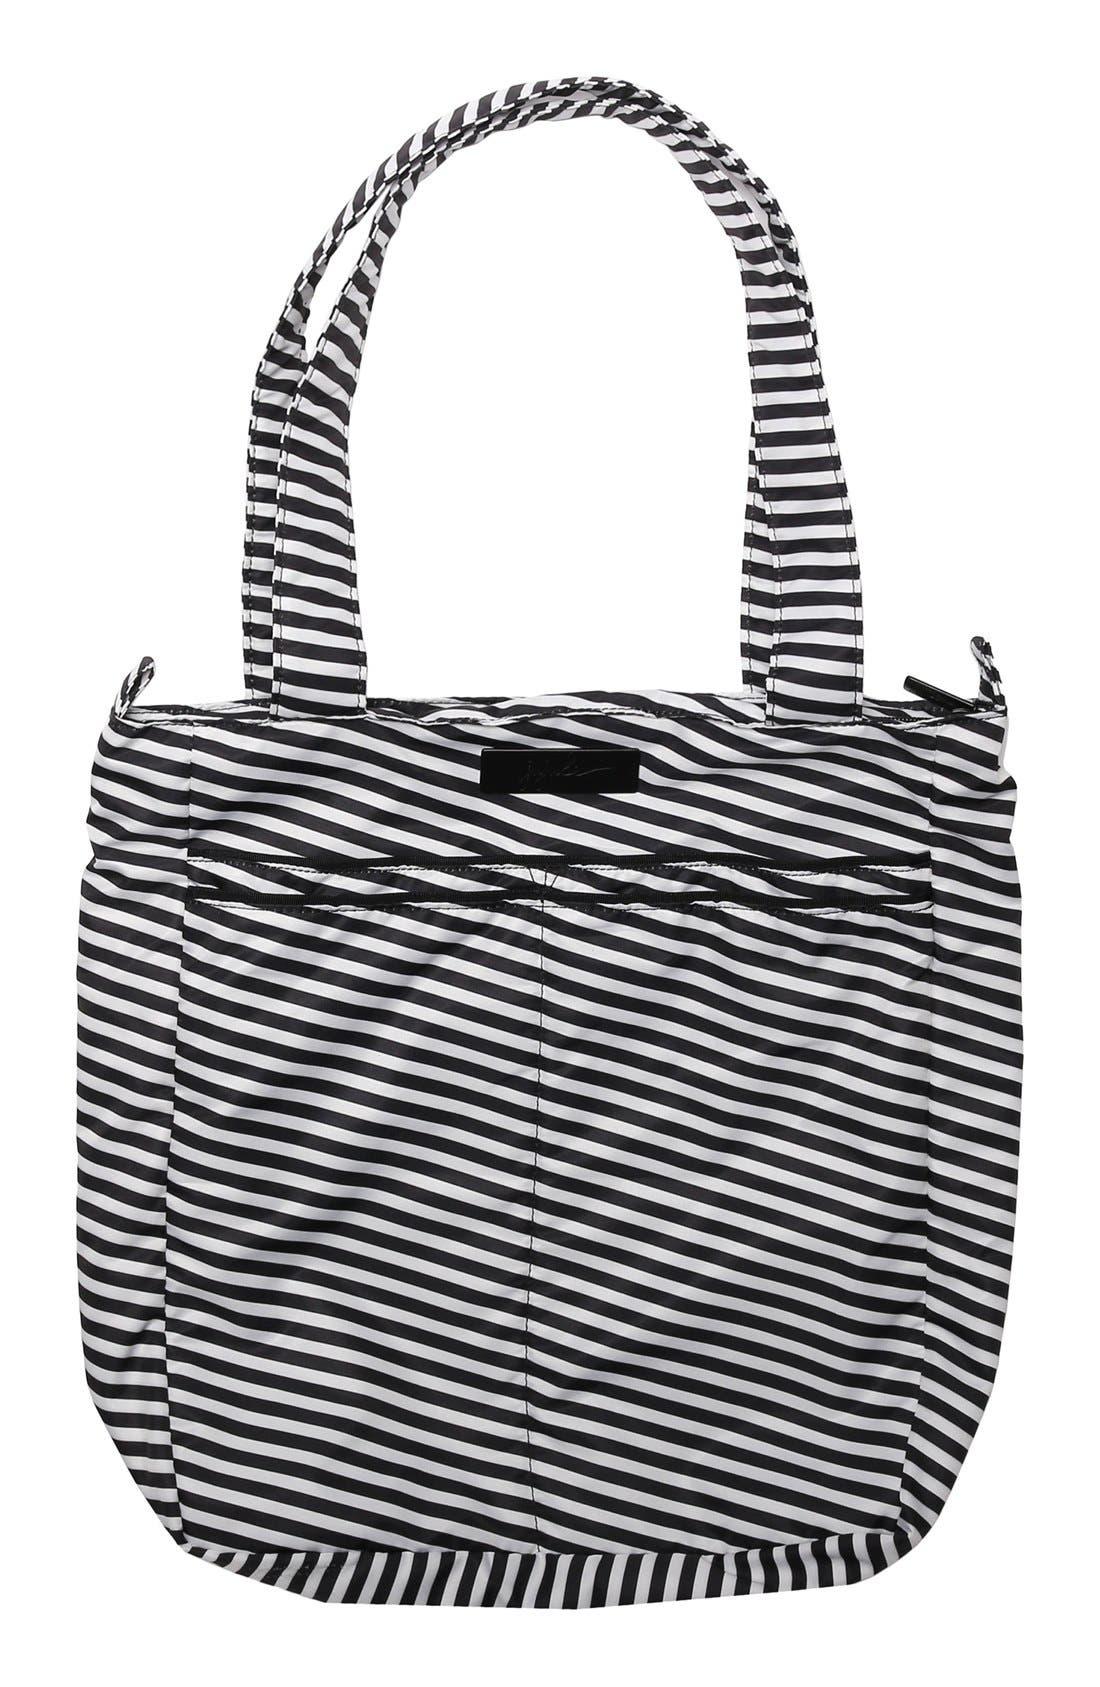 Alternate Image 1 Selected - Ju-Ju-Be 'Be Light - Onyx Collection' Diaper Bag